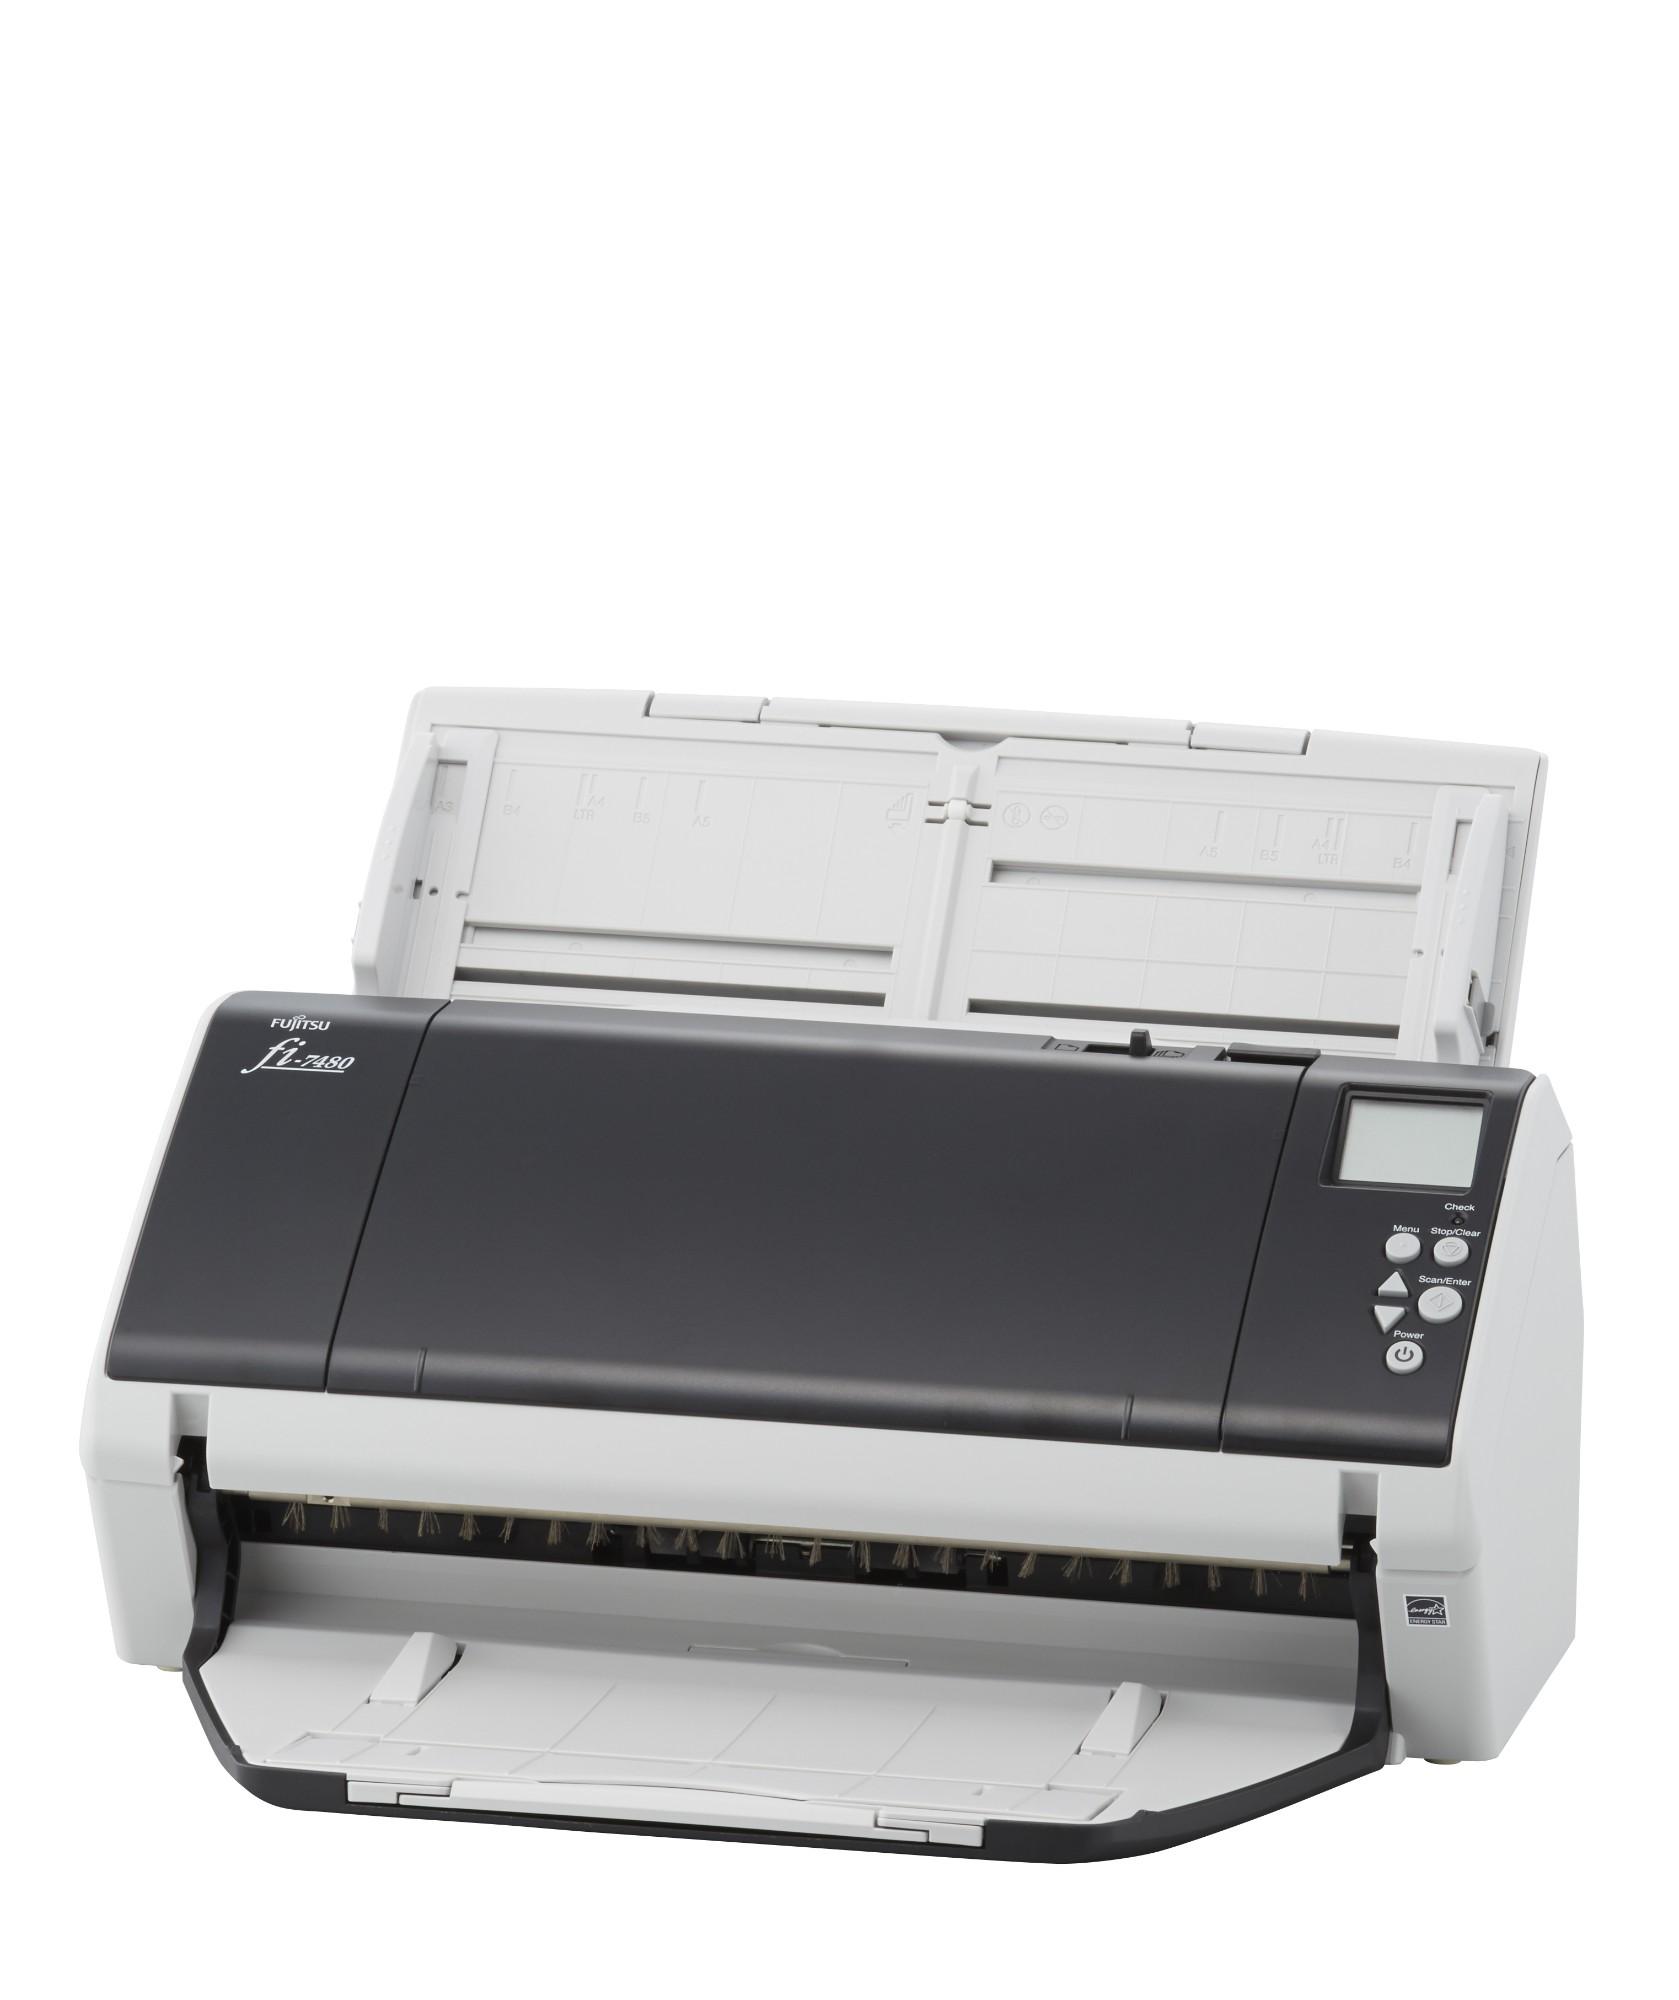 Fujitsu fi-7480 ADF scanner 600 x 600DPI A3 Grey,White